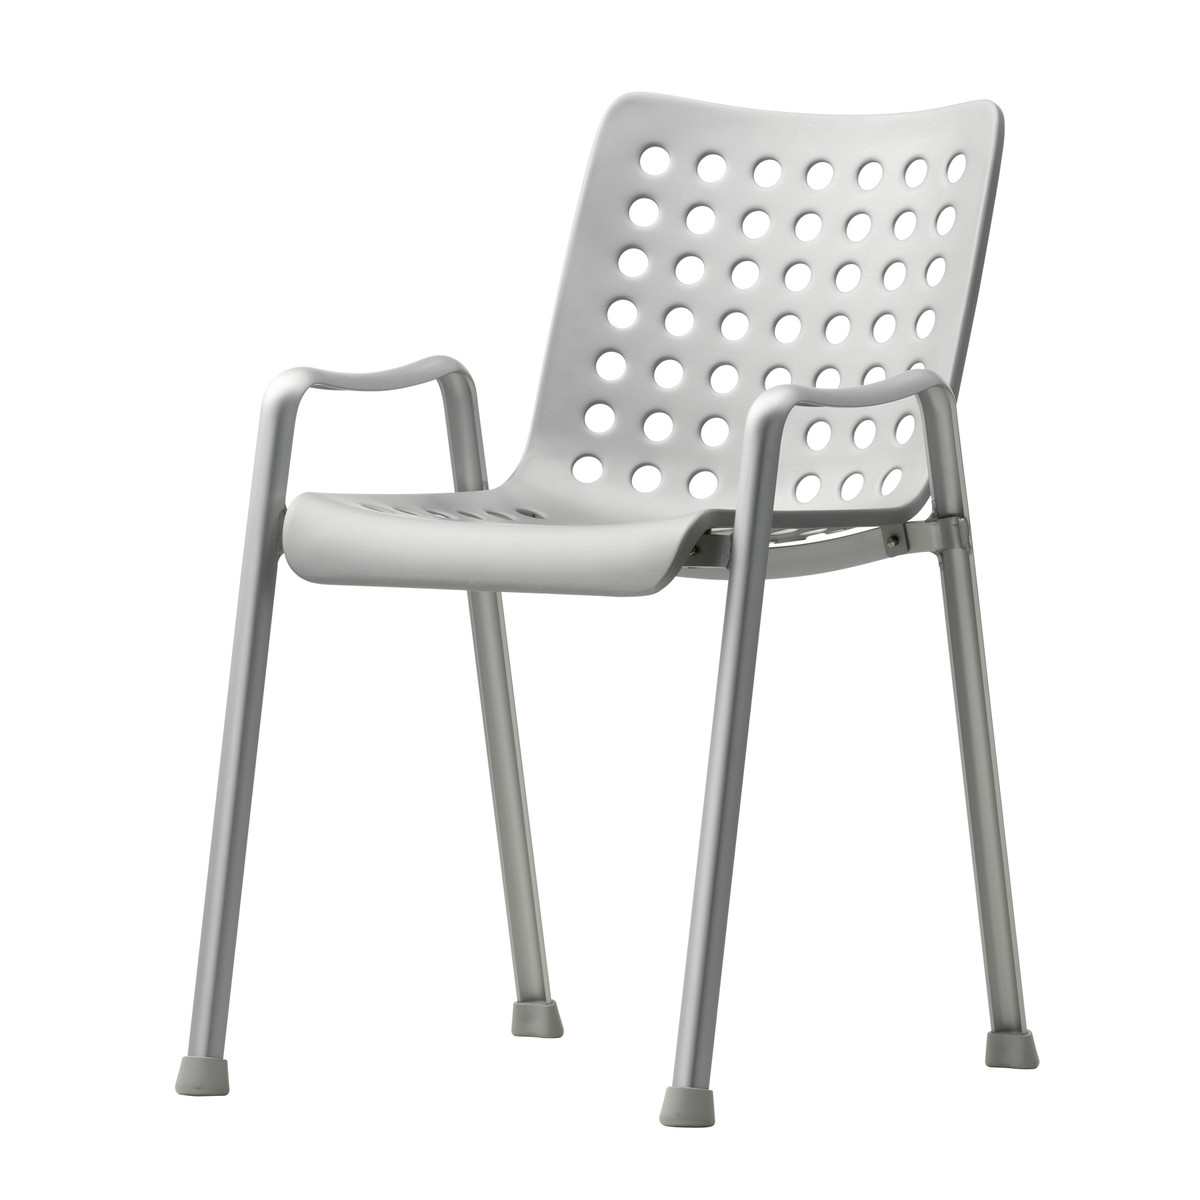 vitra landi chair 455. Black Bedroom Furniture Sets. Home Design Ideas